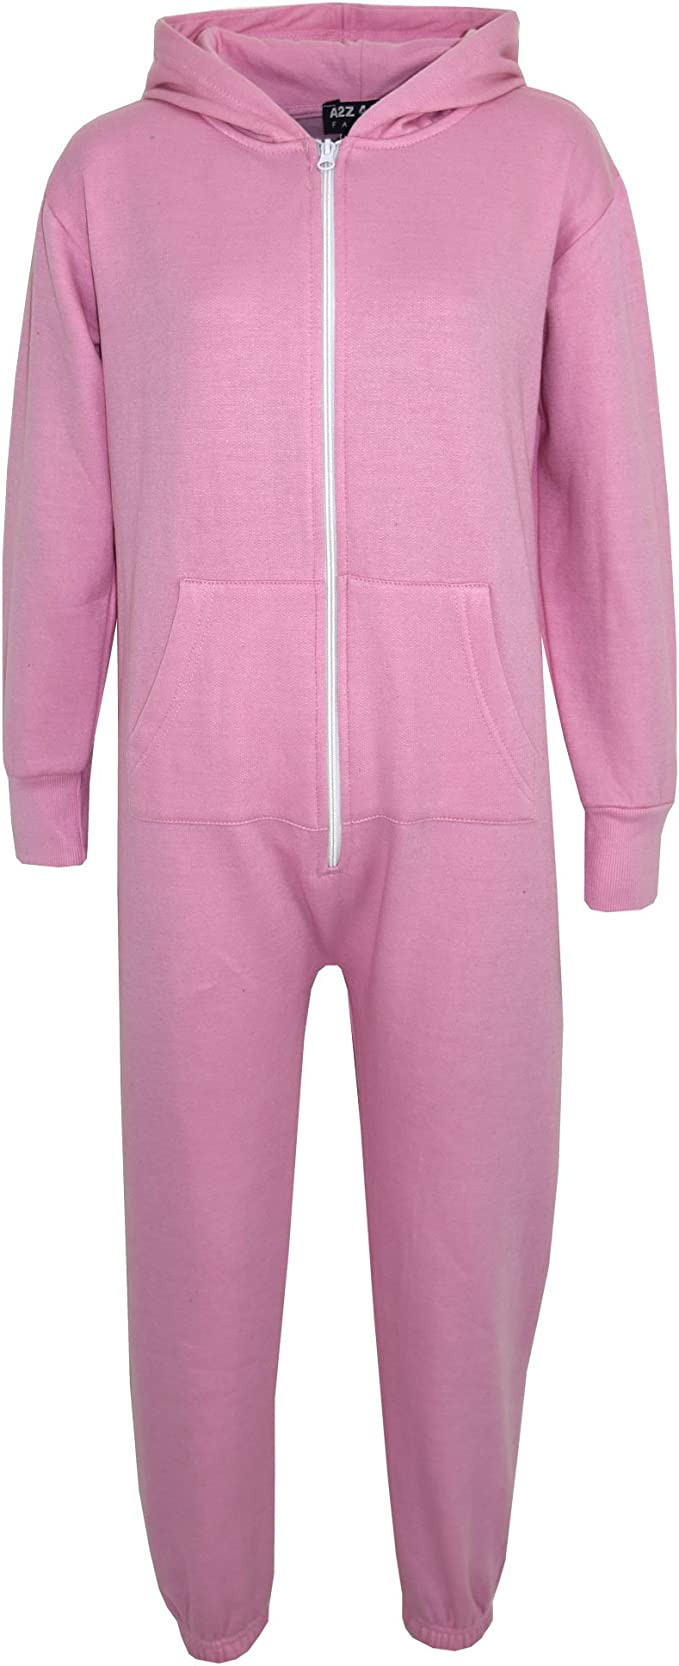 Girls Fleece 1Onesie Age 2-3 Years Pyjamas All In One Set Purple Pink One Piece